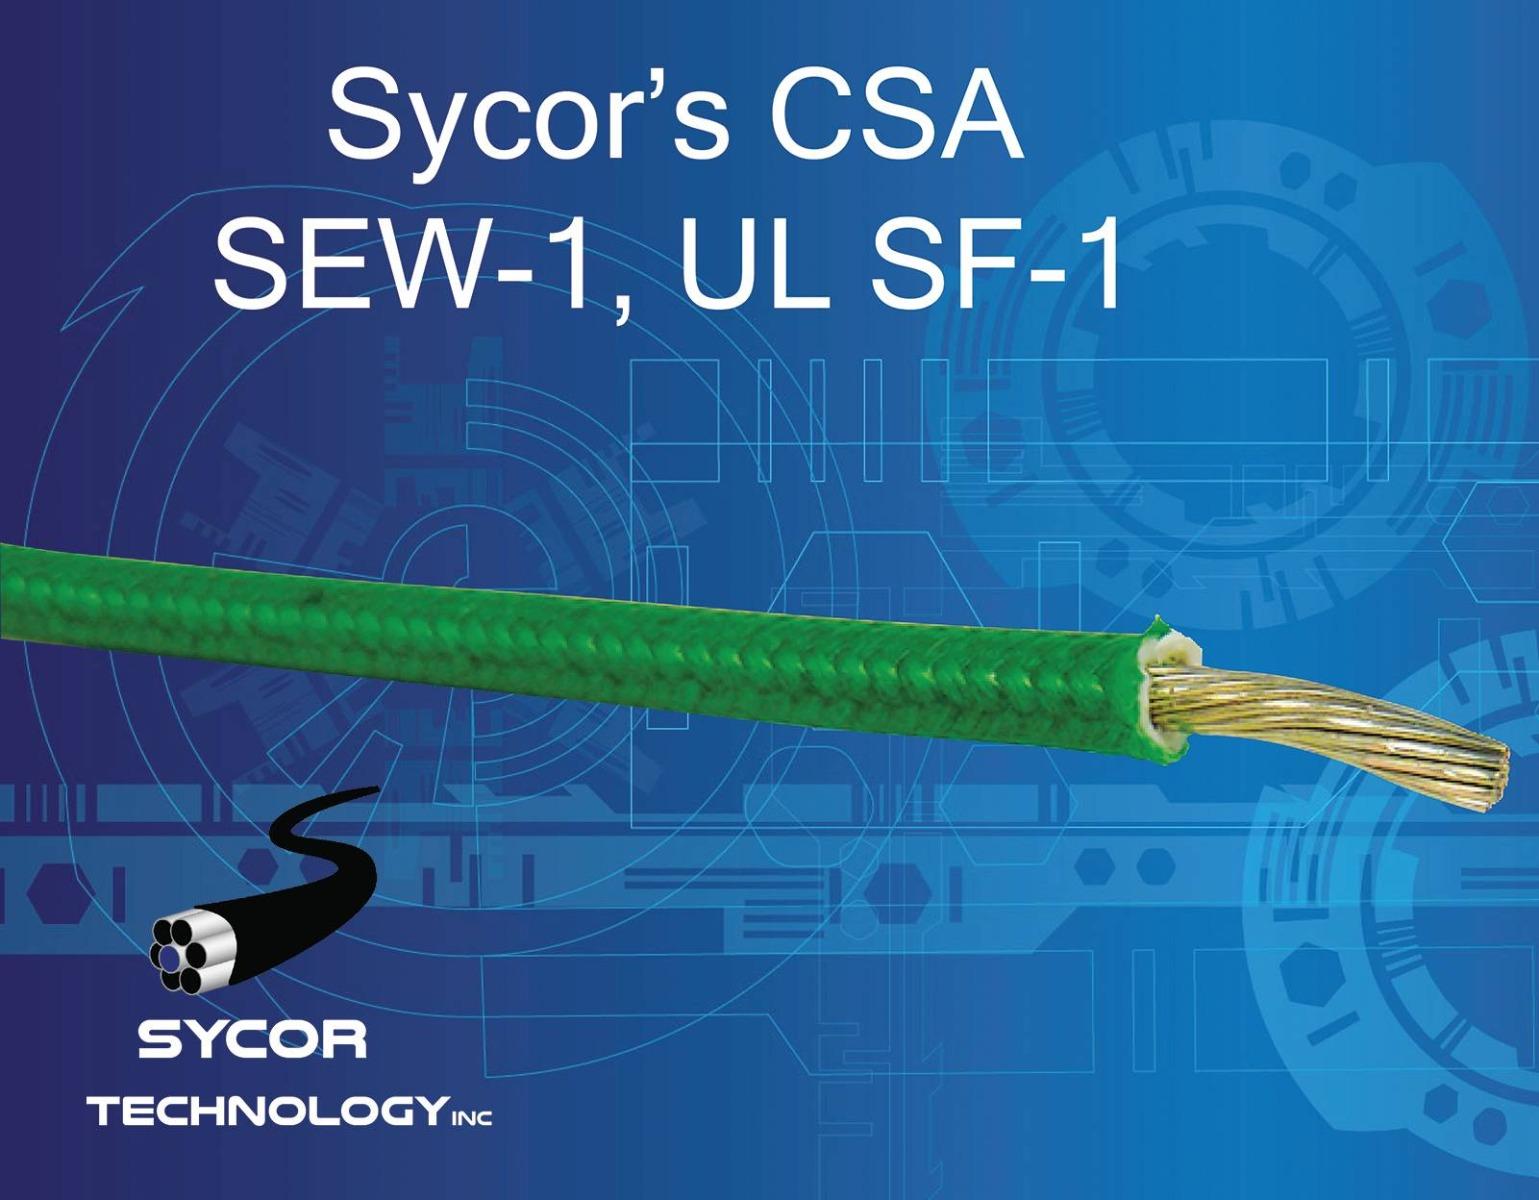 CSA SEW-1, UL SF-1